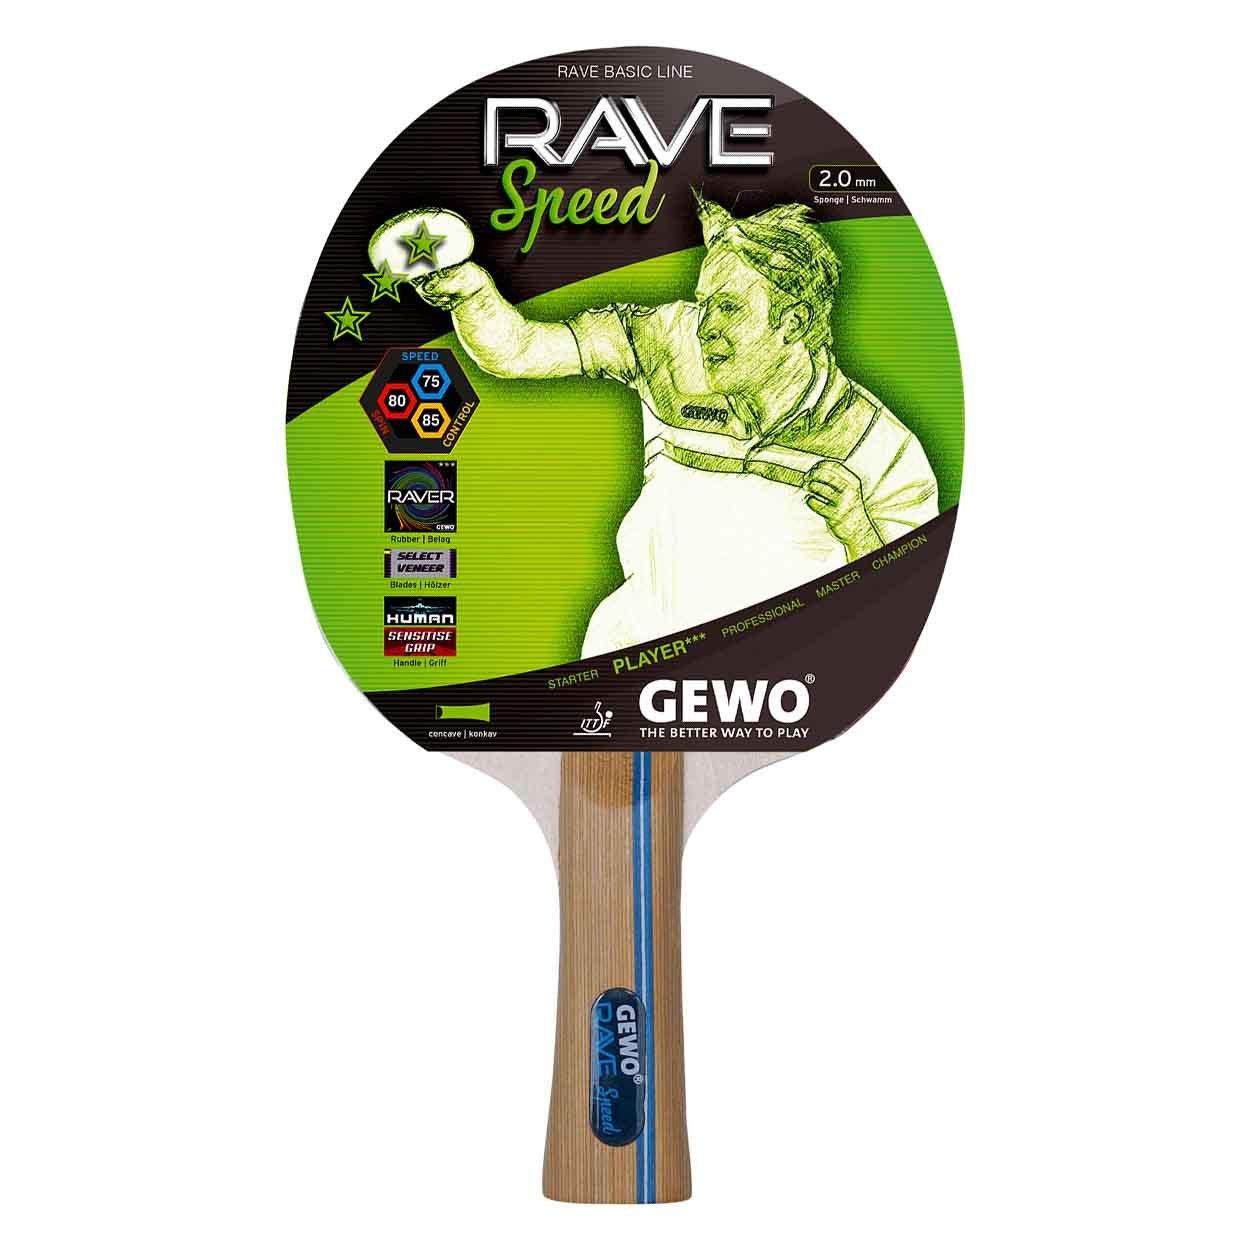 GEWO Rave Speed Cóncavo Raqueta de Tenis de Mesa, marrón, One Size ...